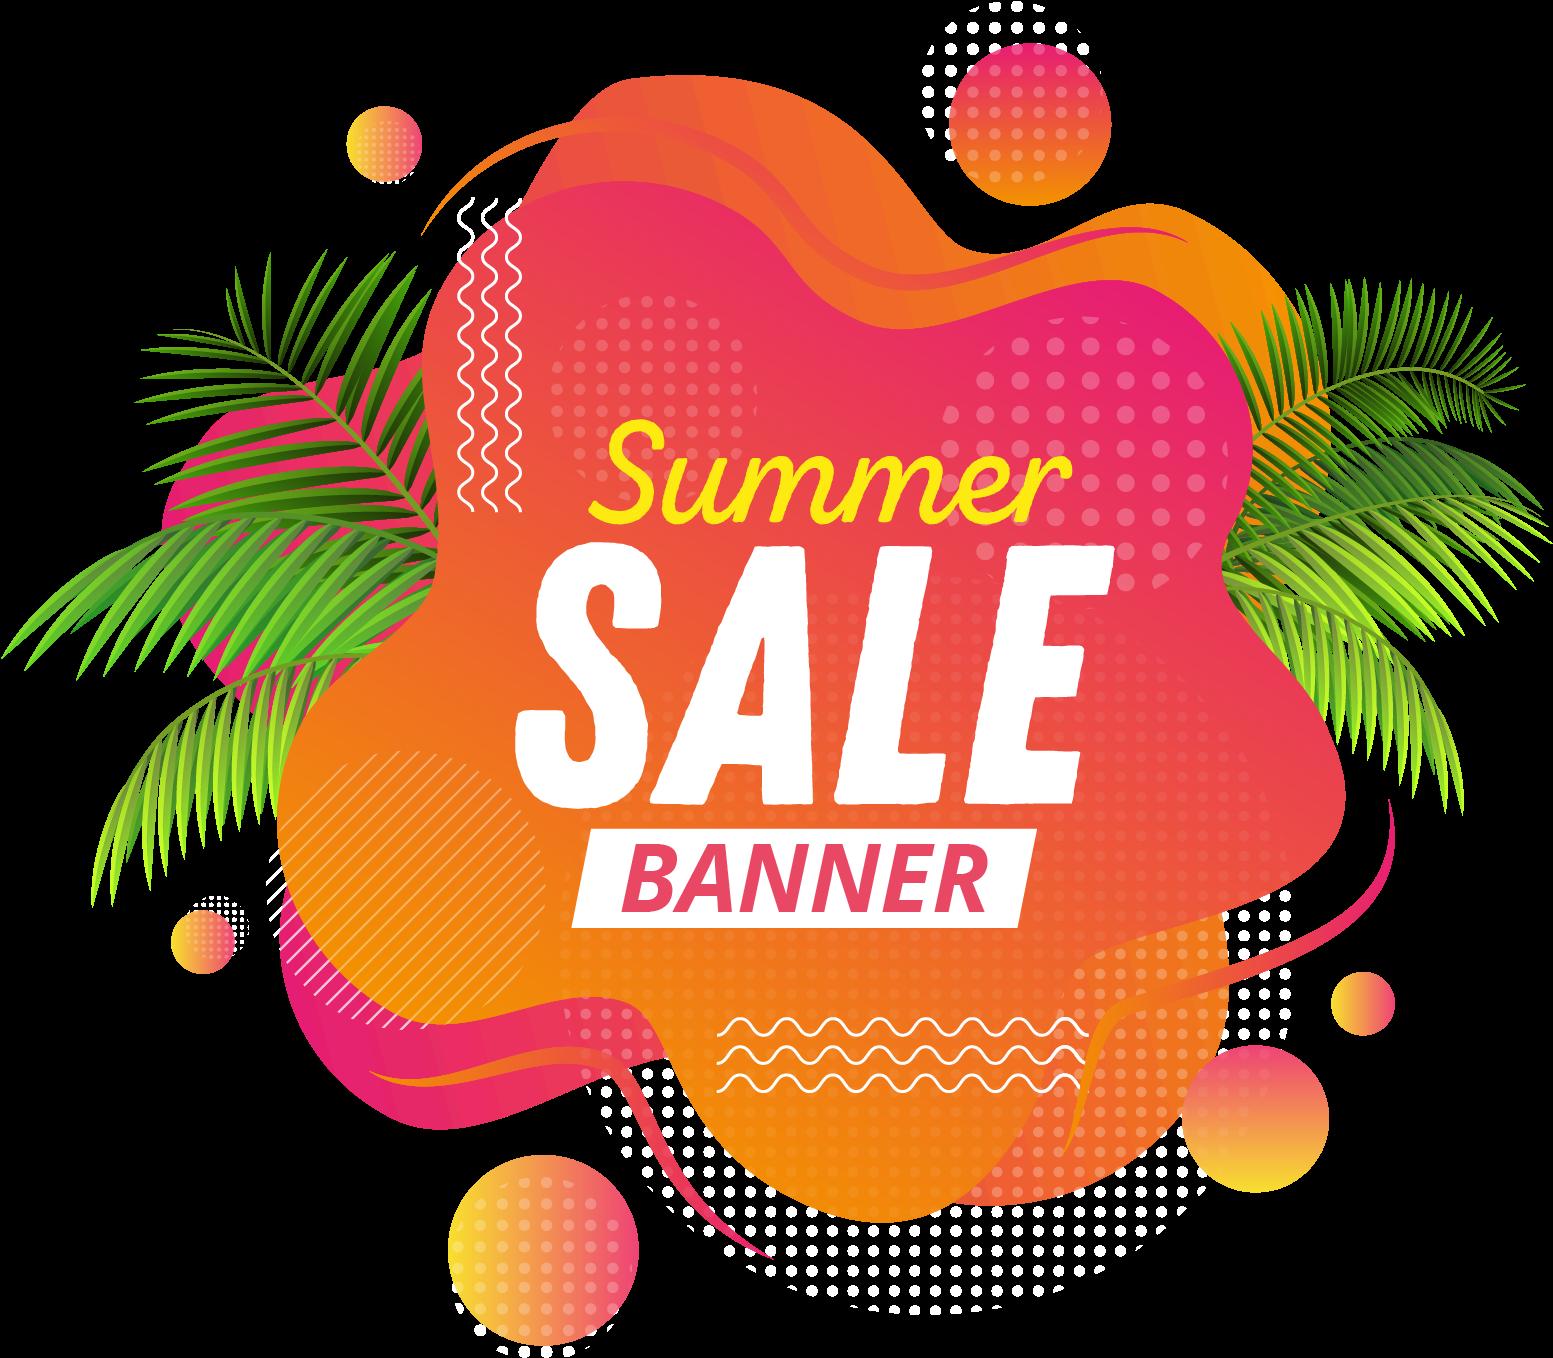 Transparent holiday sale clipart - Illustration